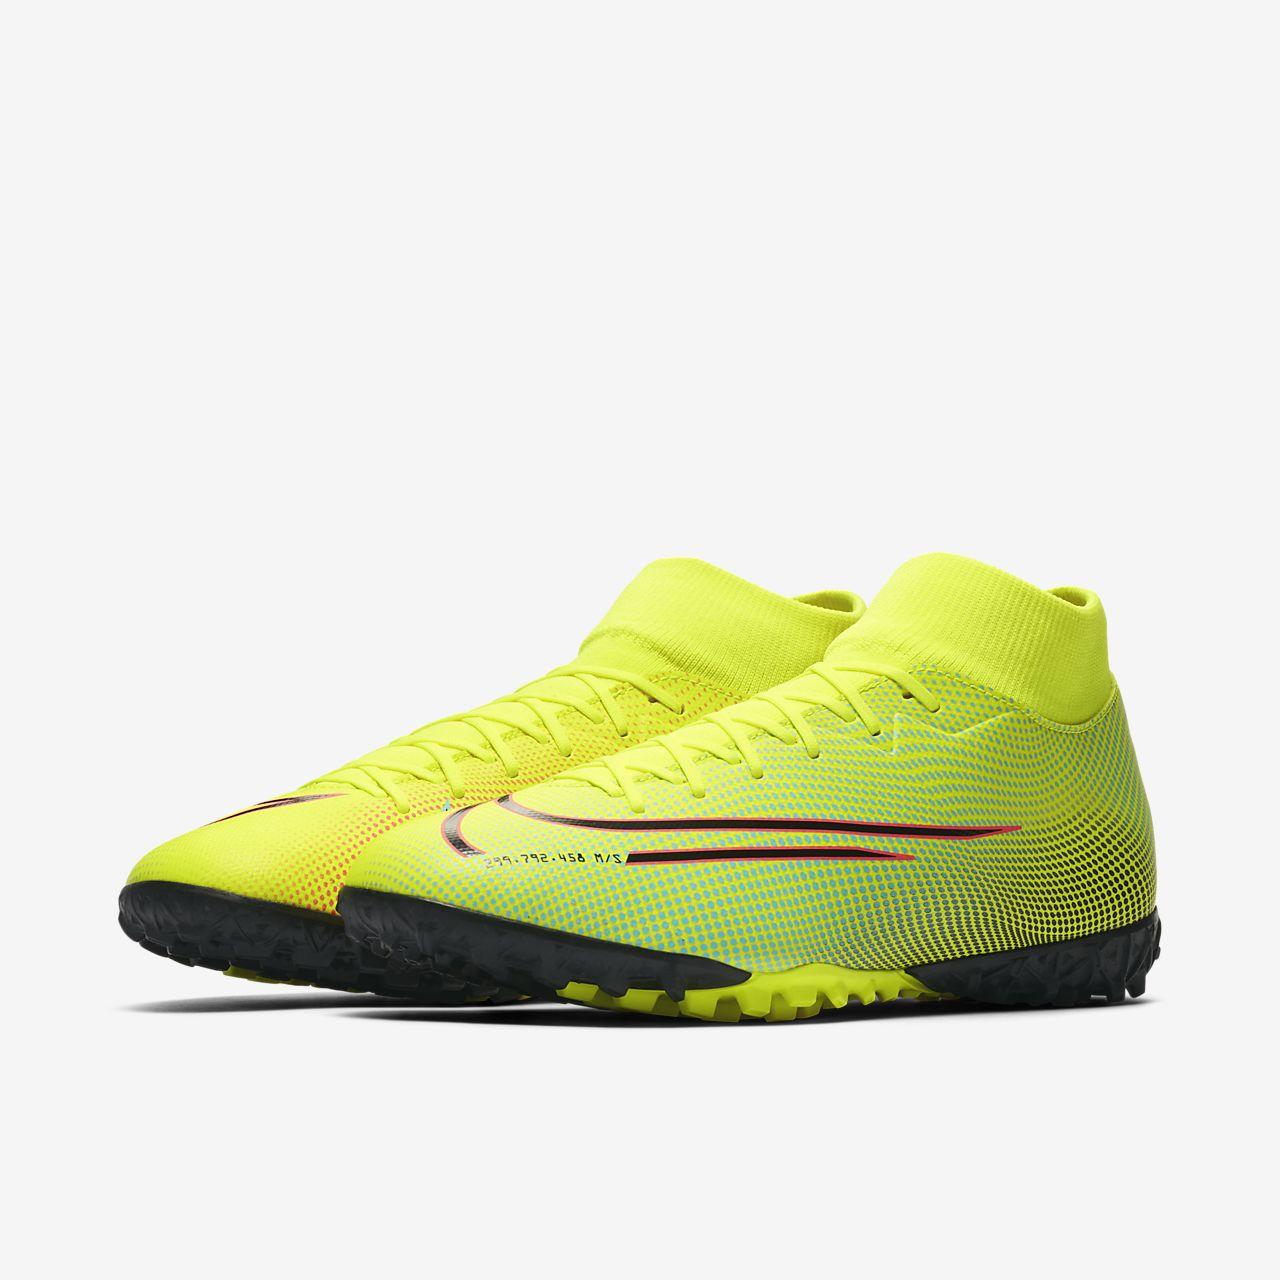 Nike Mercurial Superfly 7 Academy MDS TF Voetbalschoen (turf)